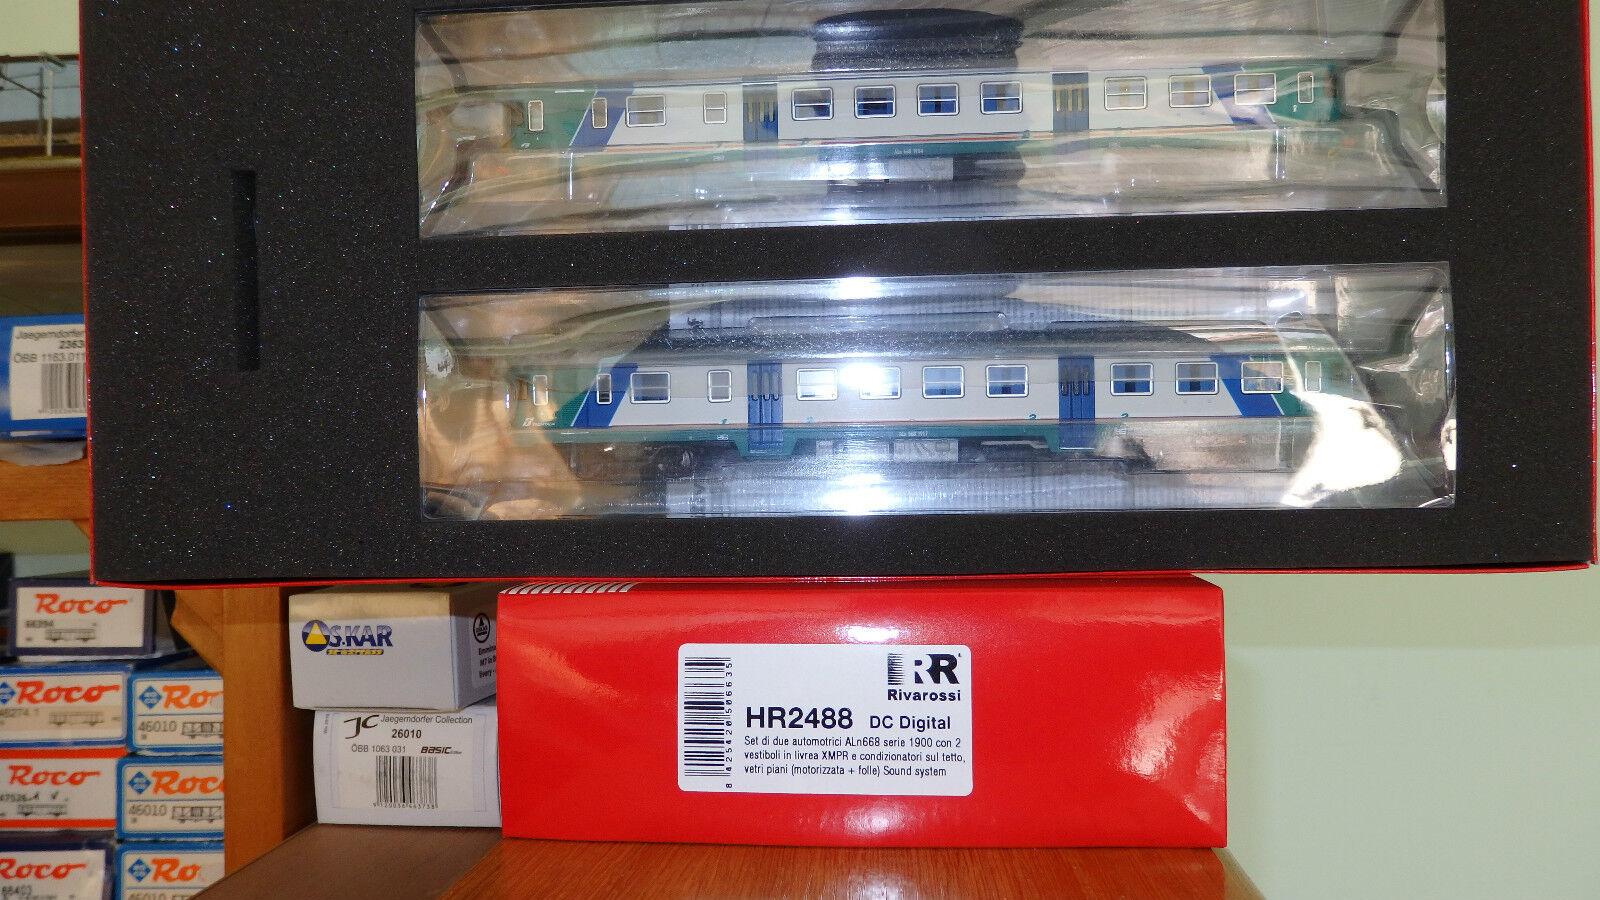 Rivarossi HR2488 Aln 668 Xmpr Trenitalia,Window Floors,Motoriz + Idler DCC Sound